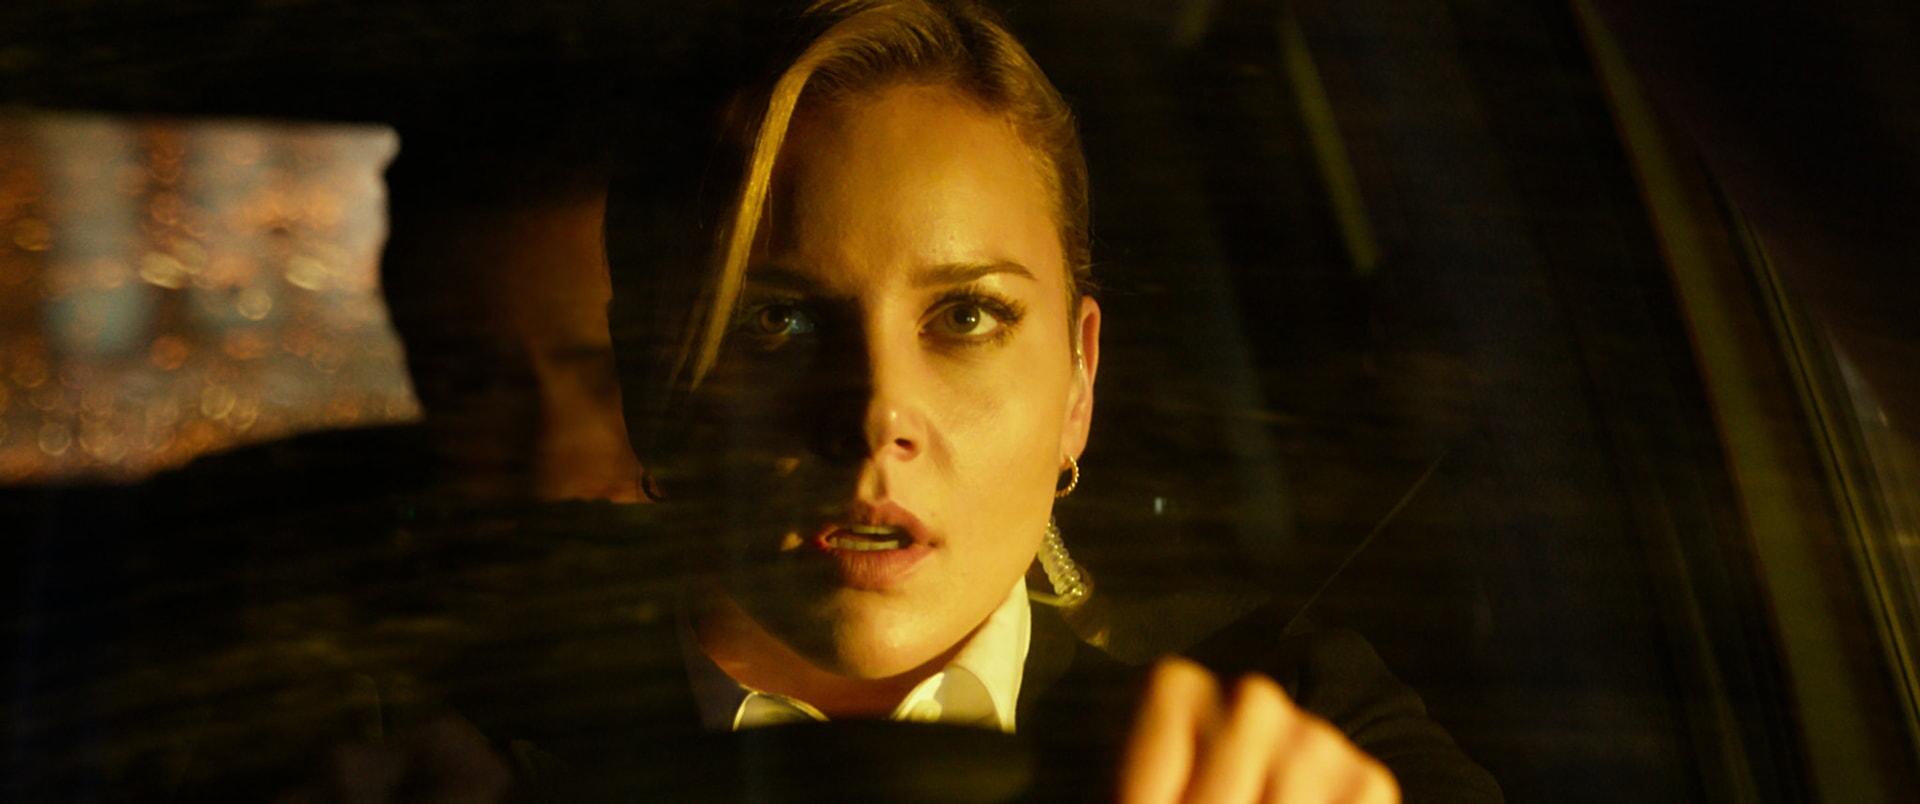 "ABBIE CORNISH as Sarah Wilson in Warner Bros. Pictures' and Skydance's suspense thriller ""GEOSTORM,"" a Warner Bros. Pictures release."